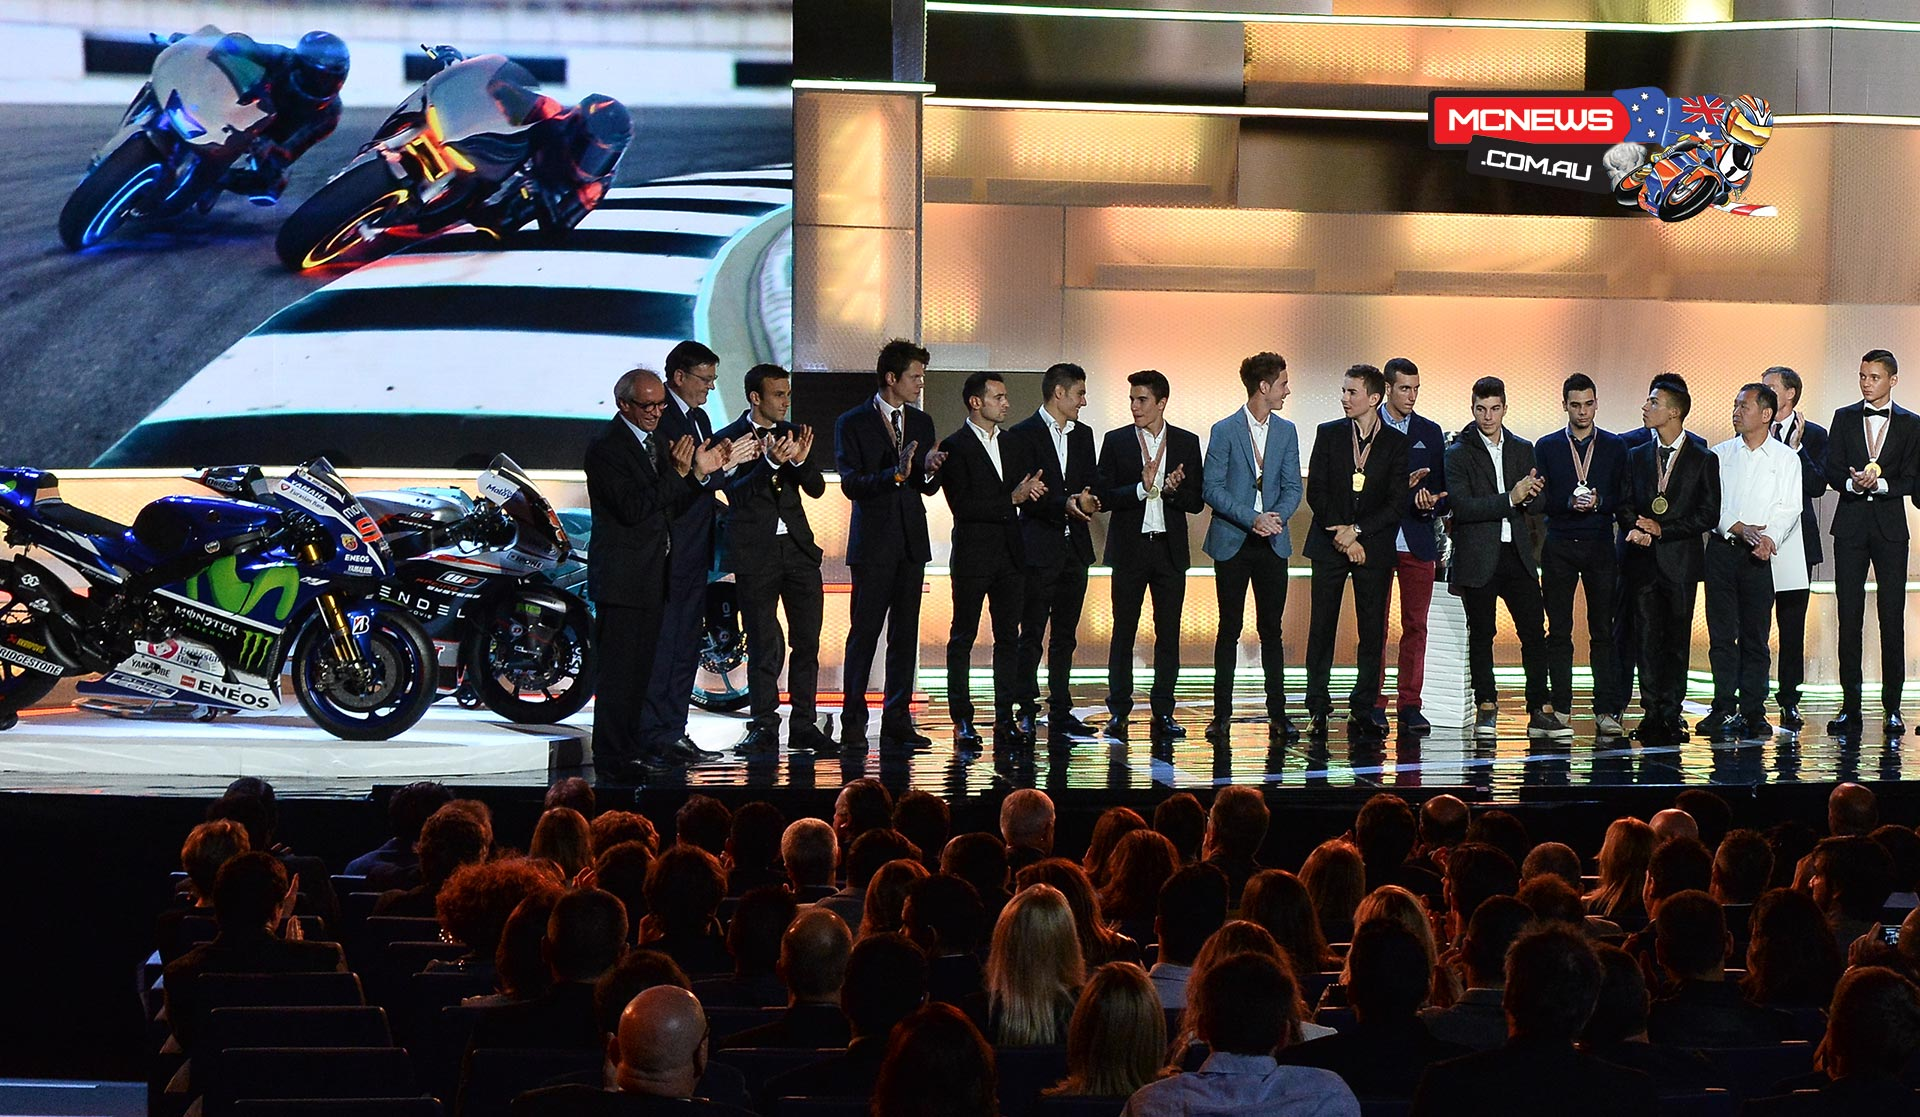 FIM Awards Ceremony completes 2015 MotoGP season